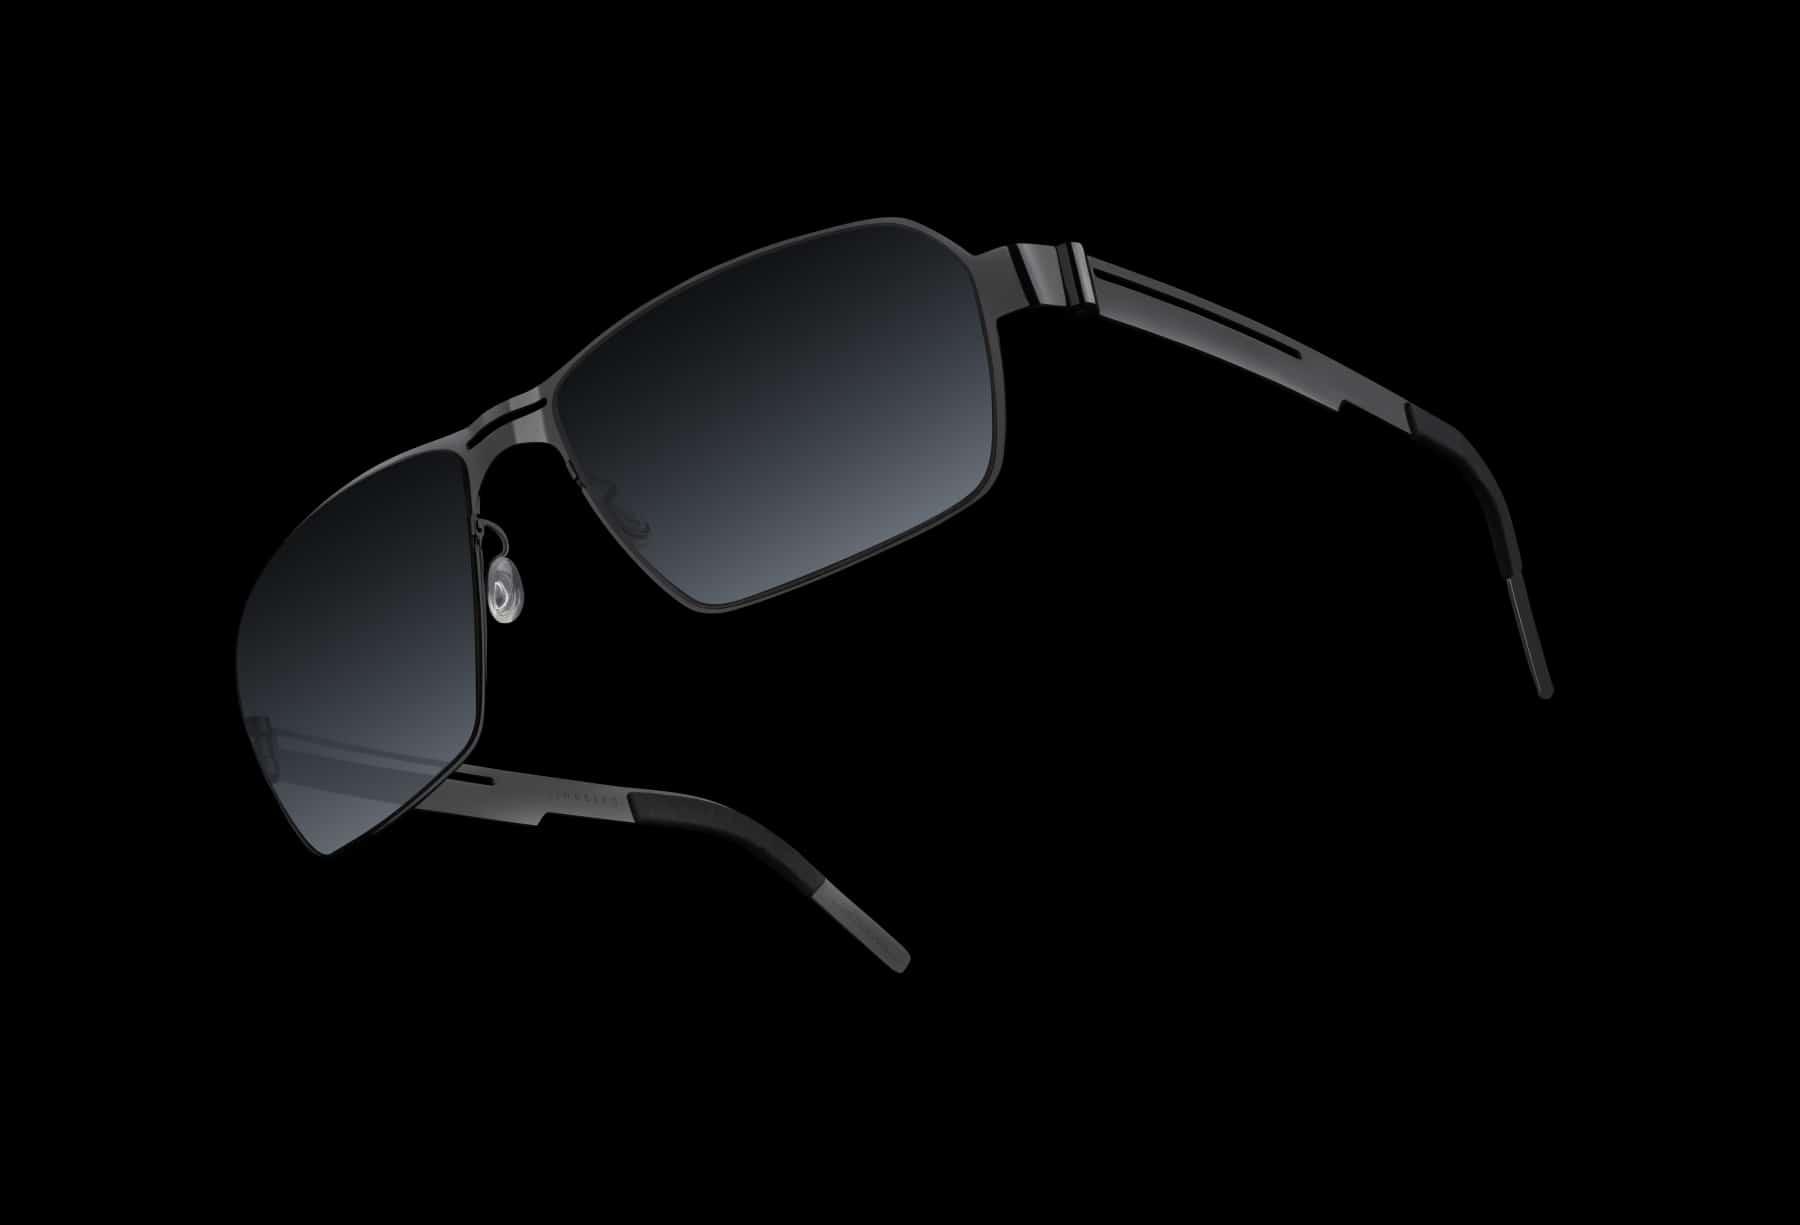 lindberg 5000 solid gold sunglasses black lens